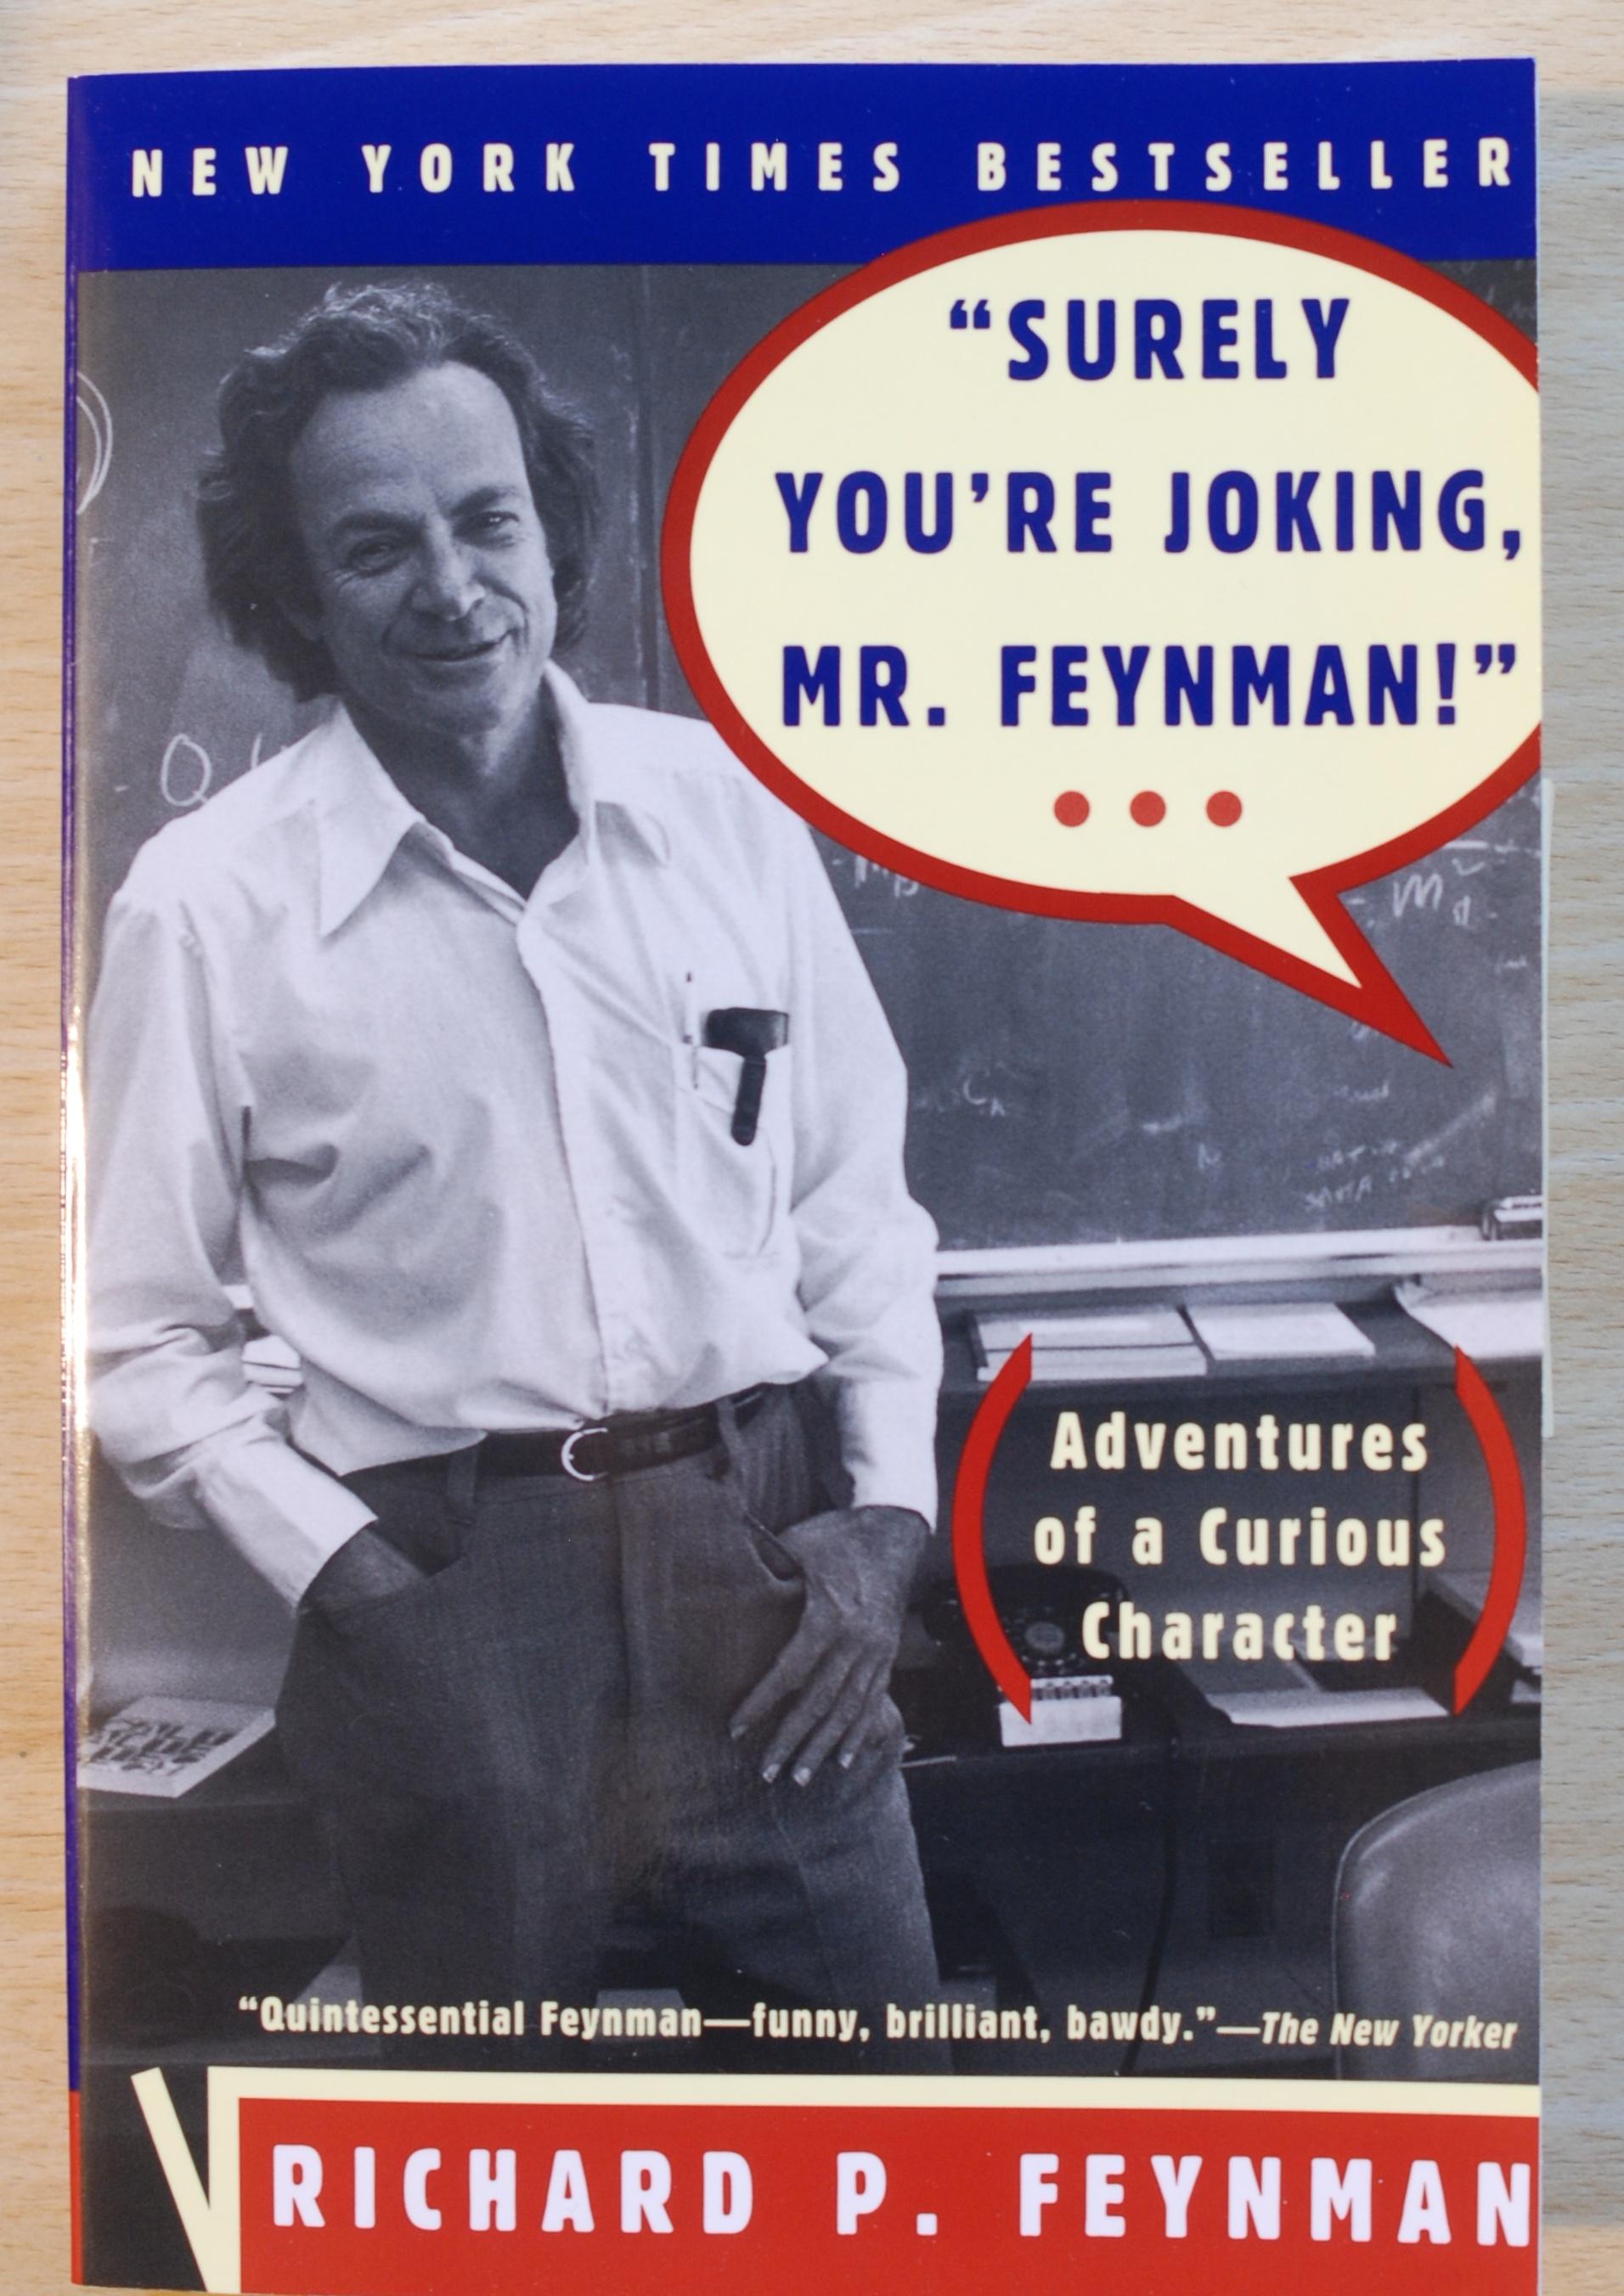 http://www.sciencecafeovervecht.nl/NAC2016/Feynman-book.jpg